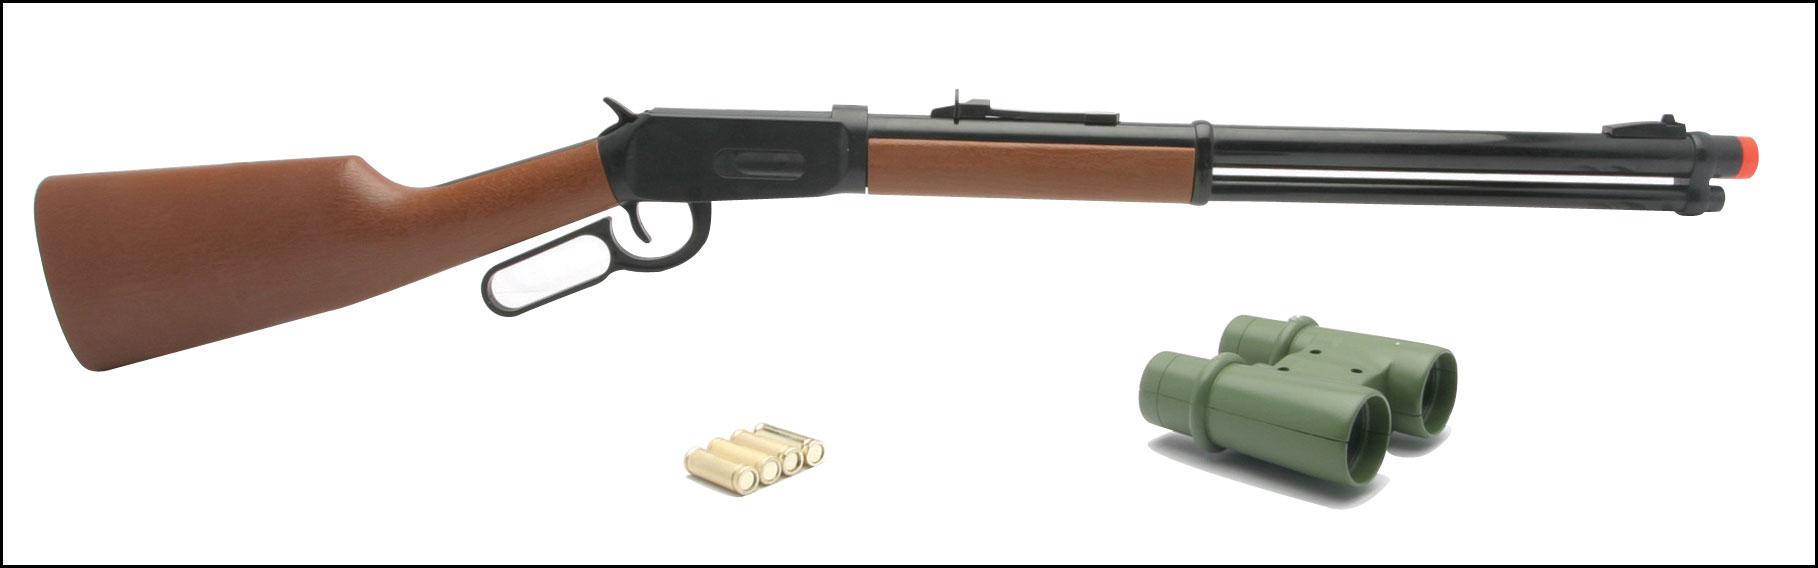 Winchester94-toy-newray